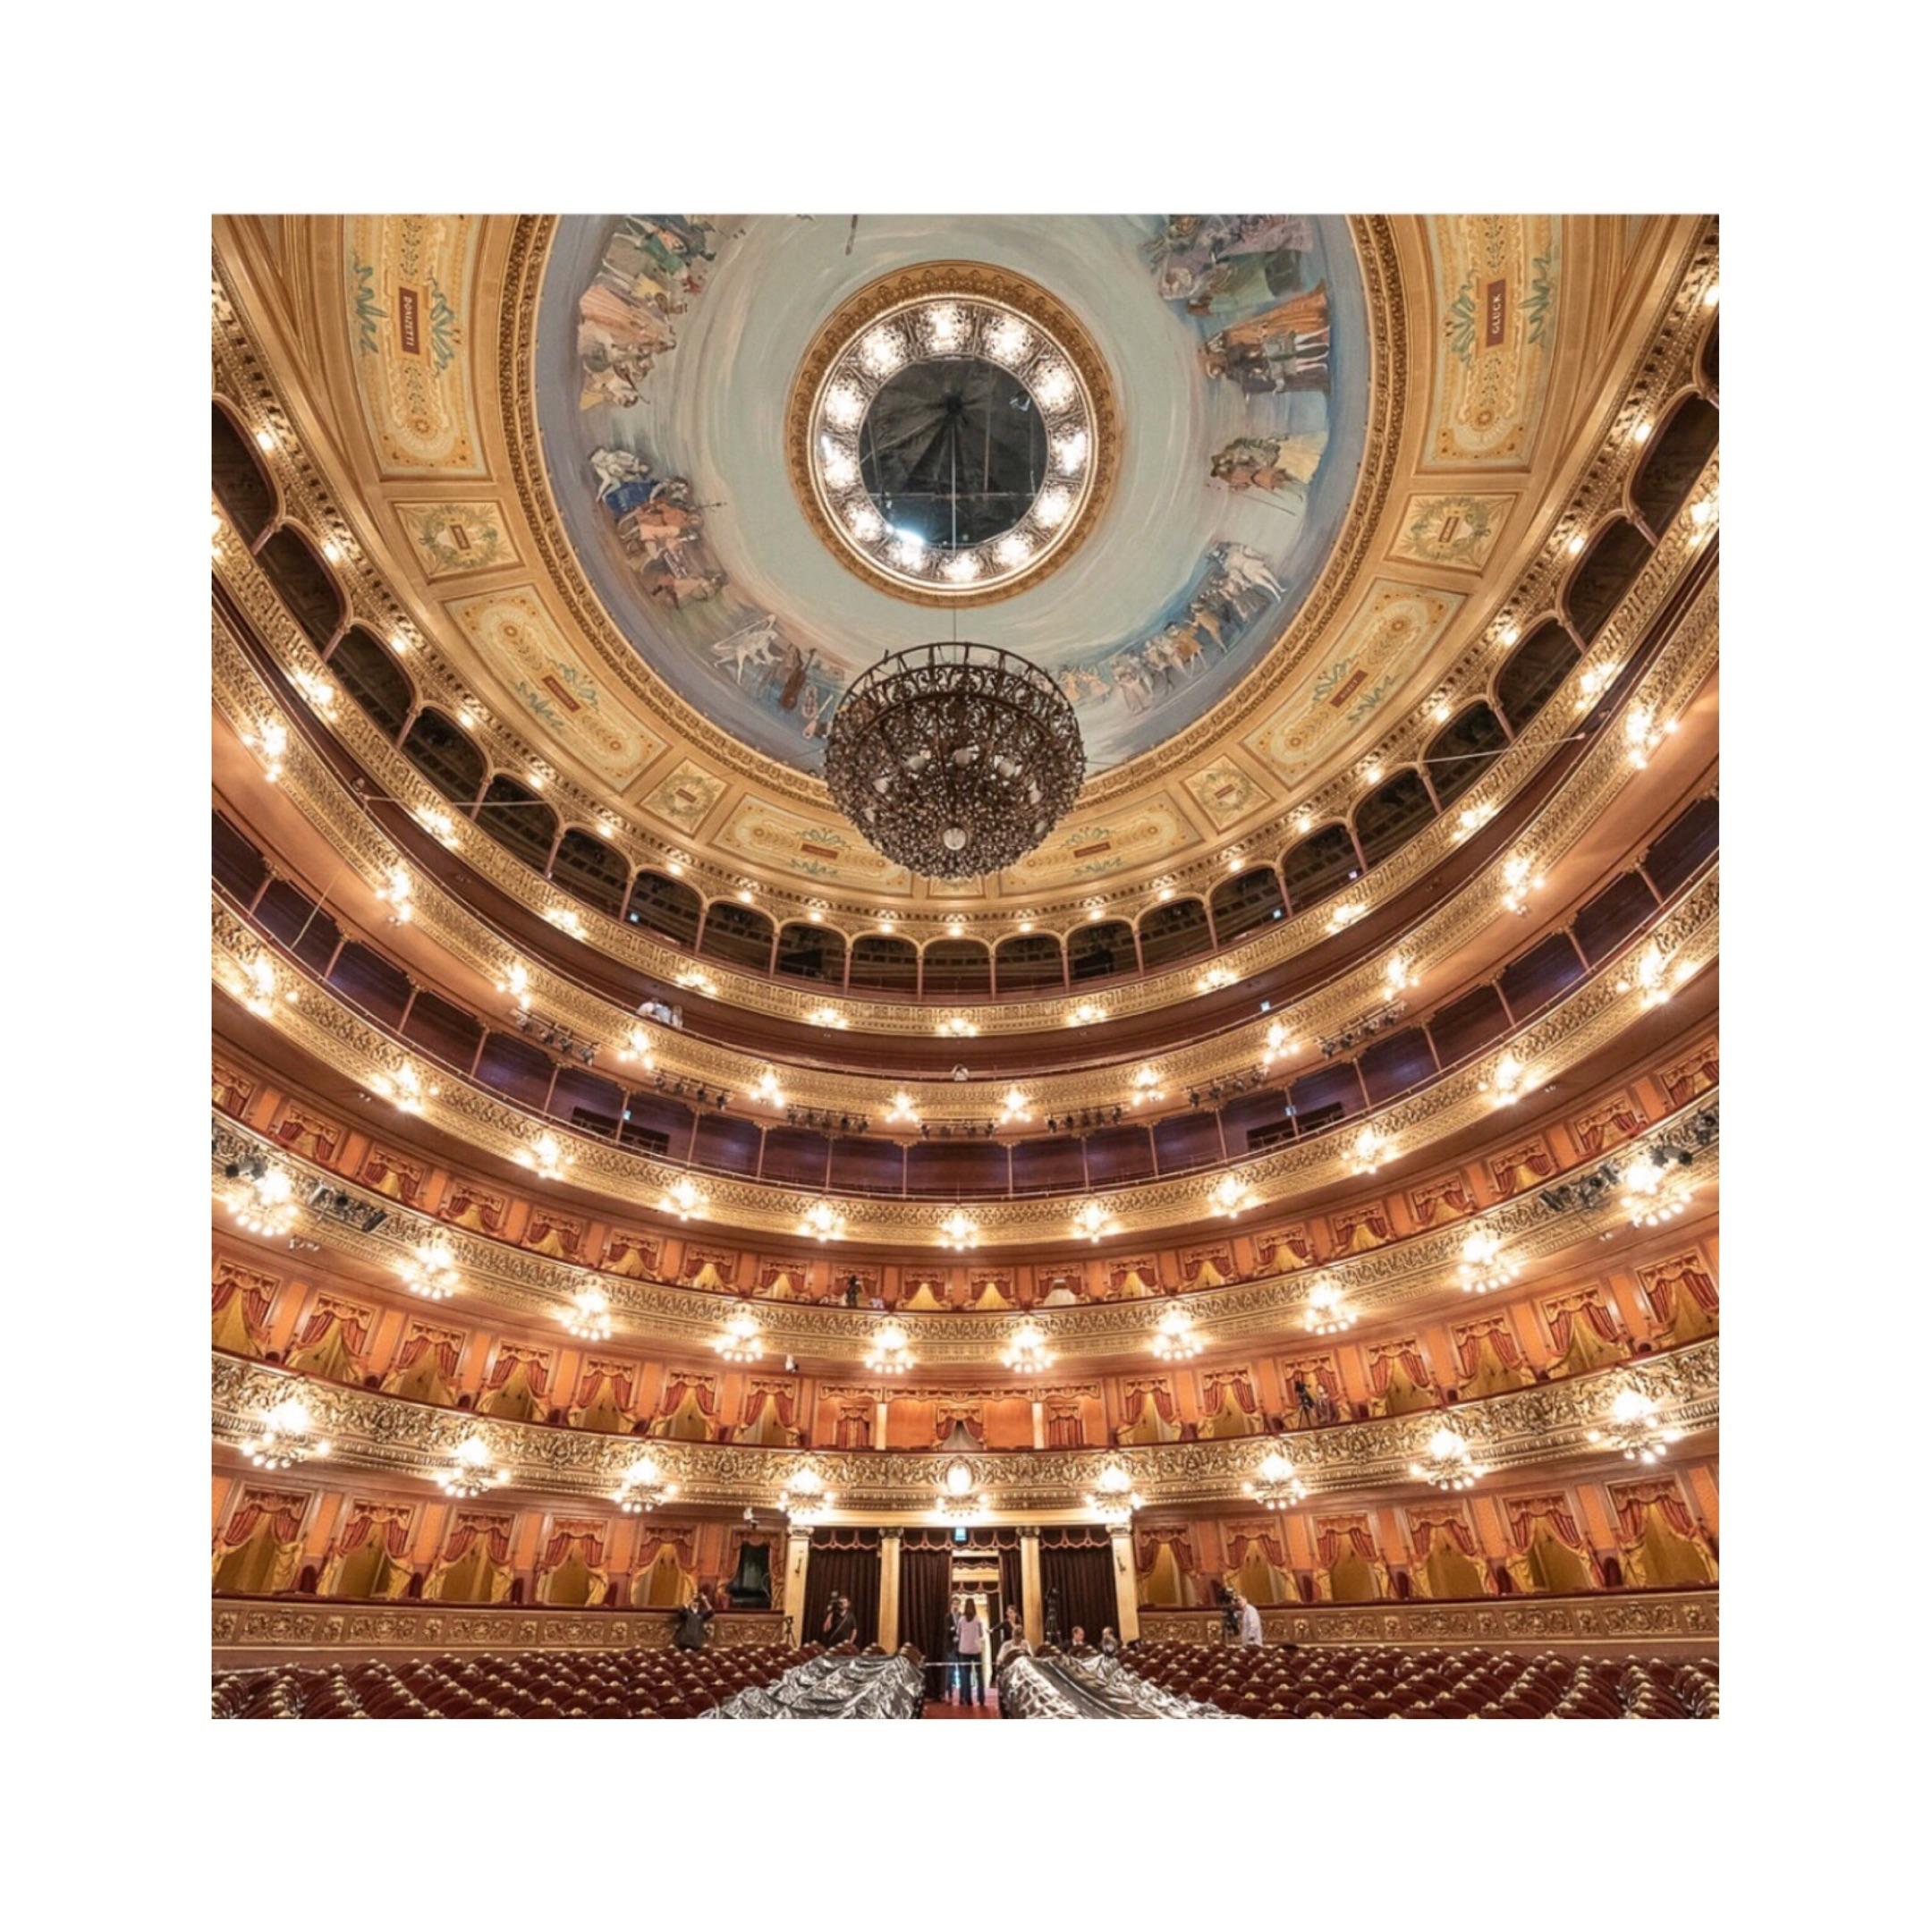 Teatro Colón Buenos Aires, Argentina #sensorialexperience FRASSAÏ #buenosairesmeetsnewyork